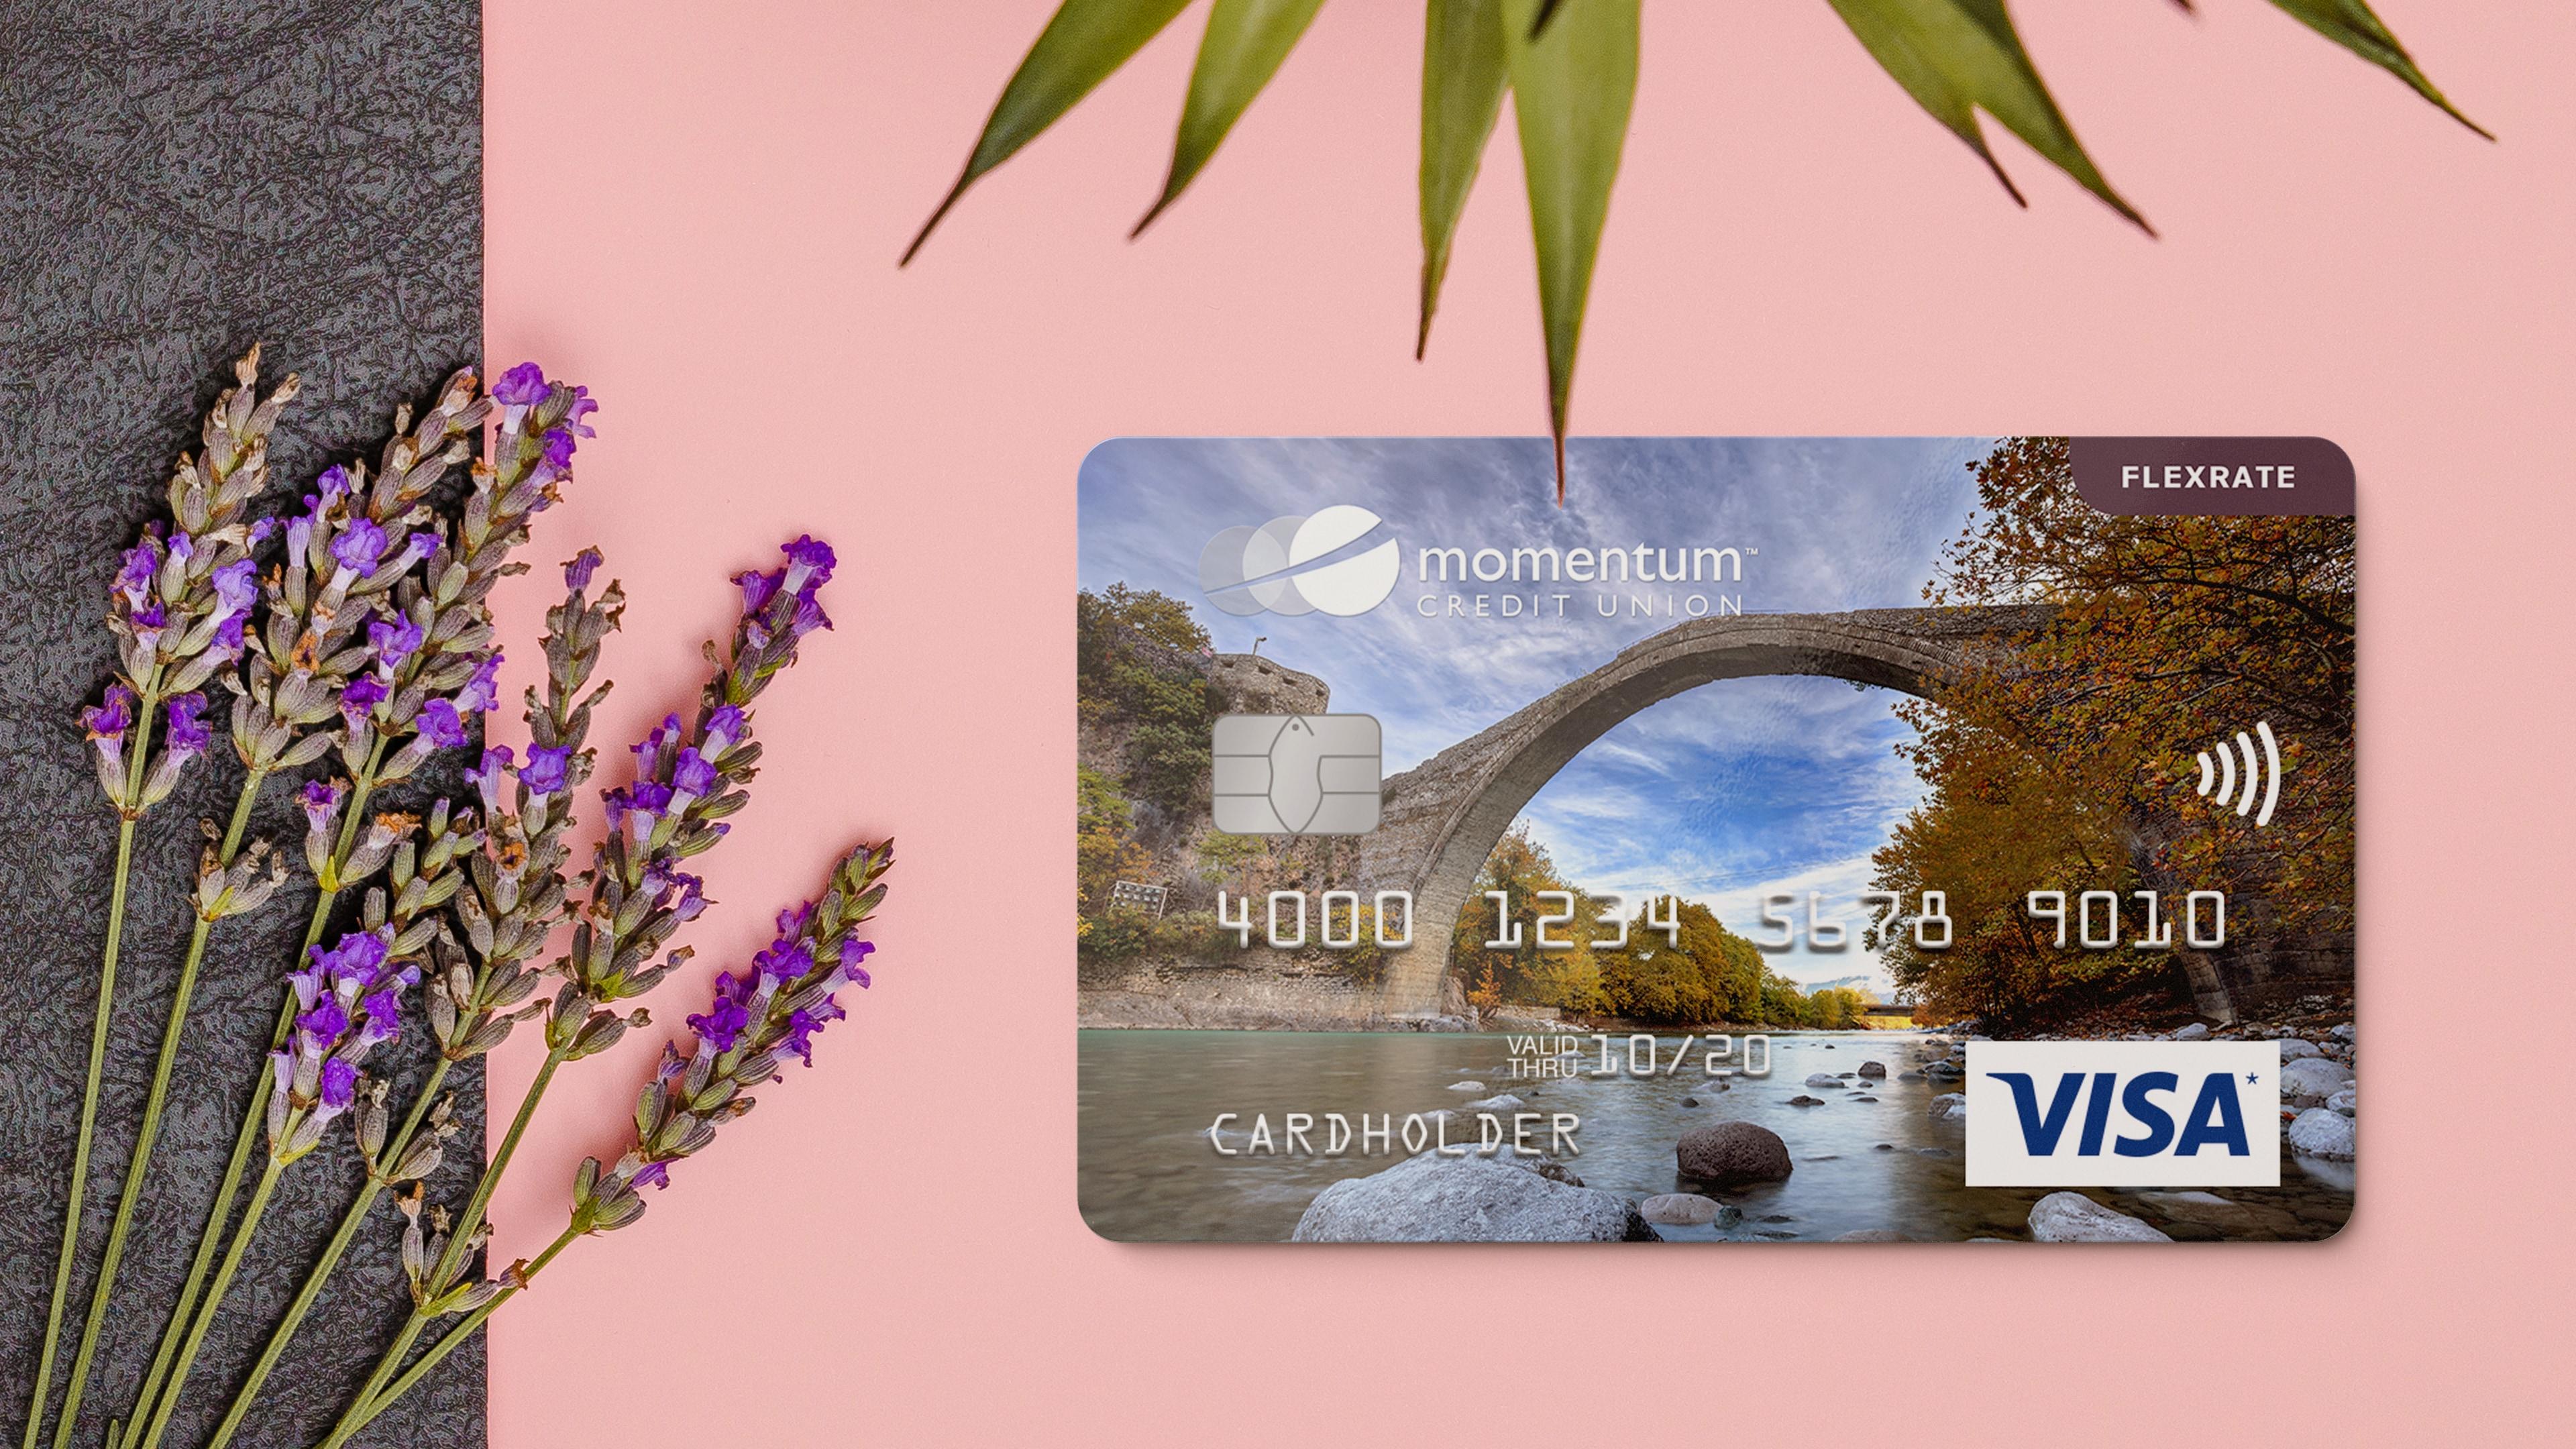 — Momentum Visa FlexRate Card